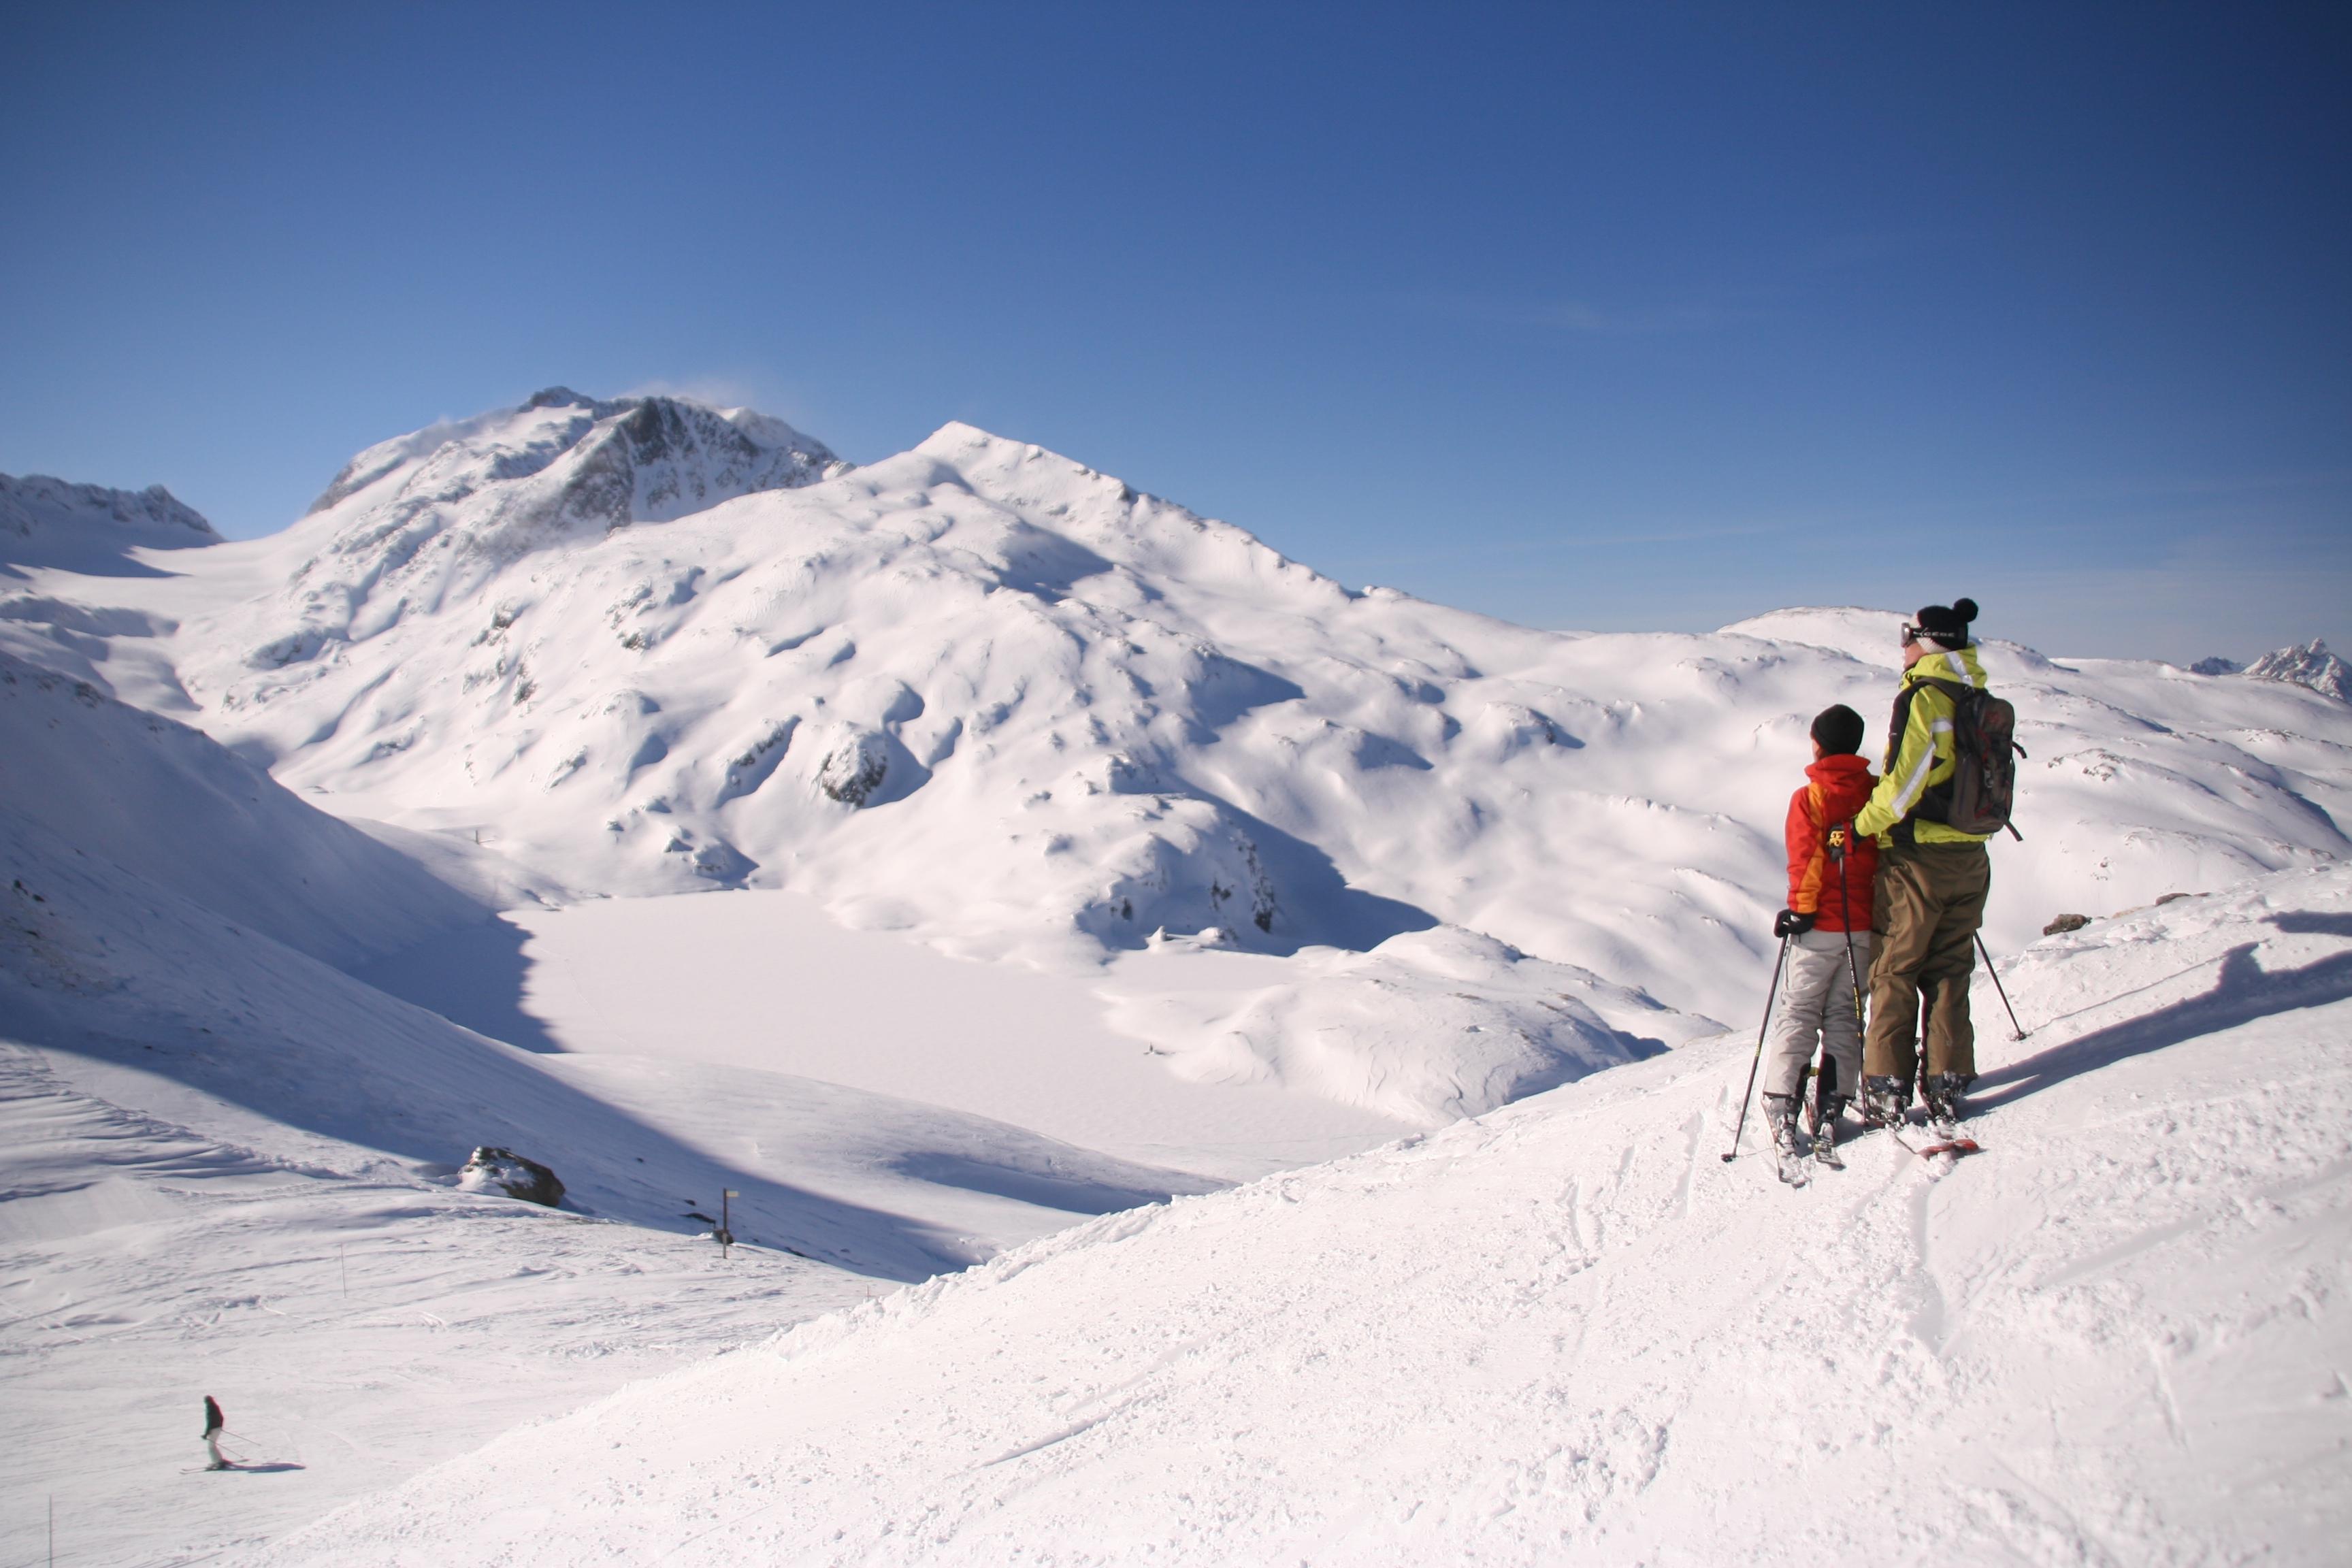 saint sorlin d'arves ski area: les sybelles – skiing, ski area map